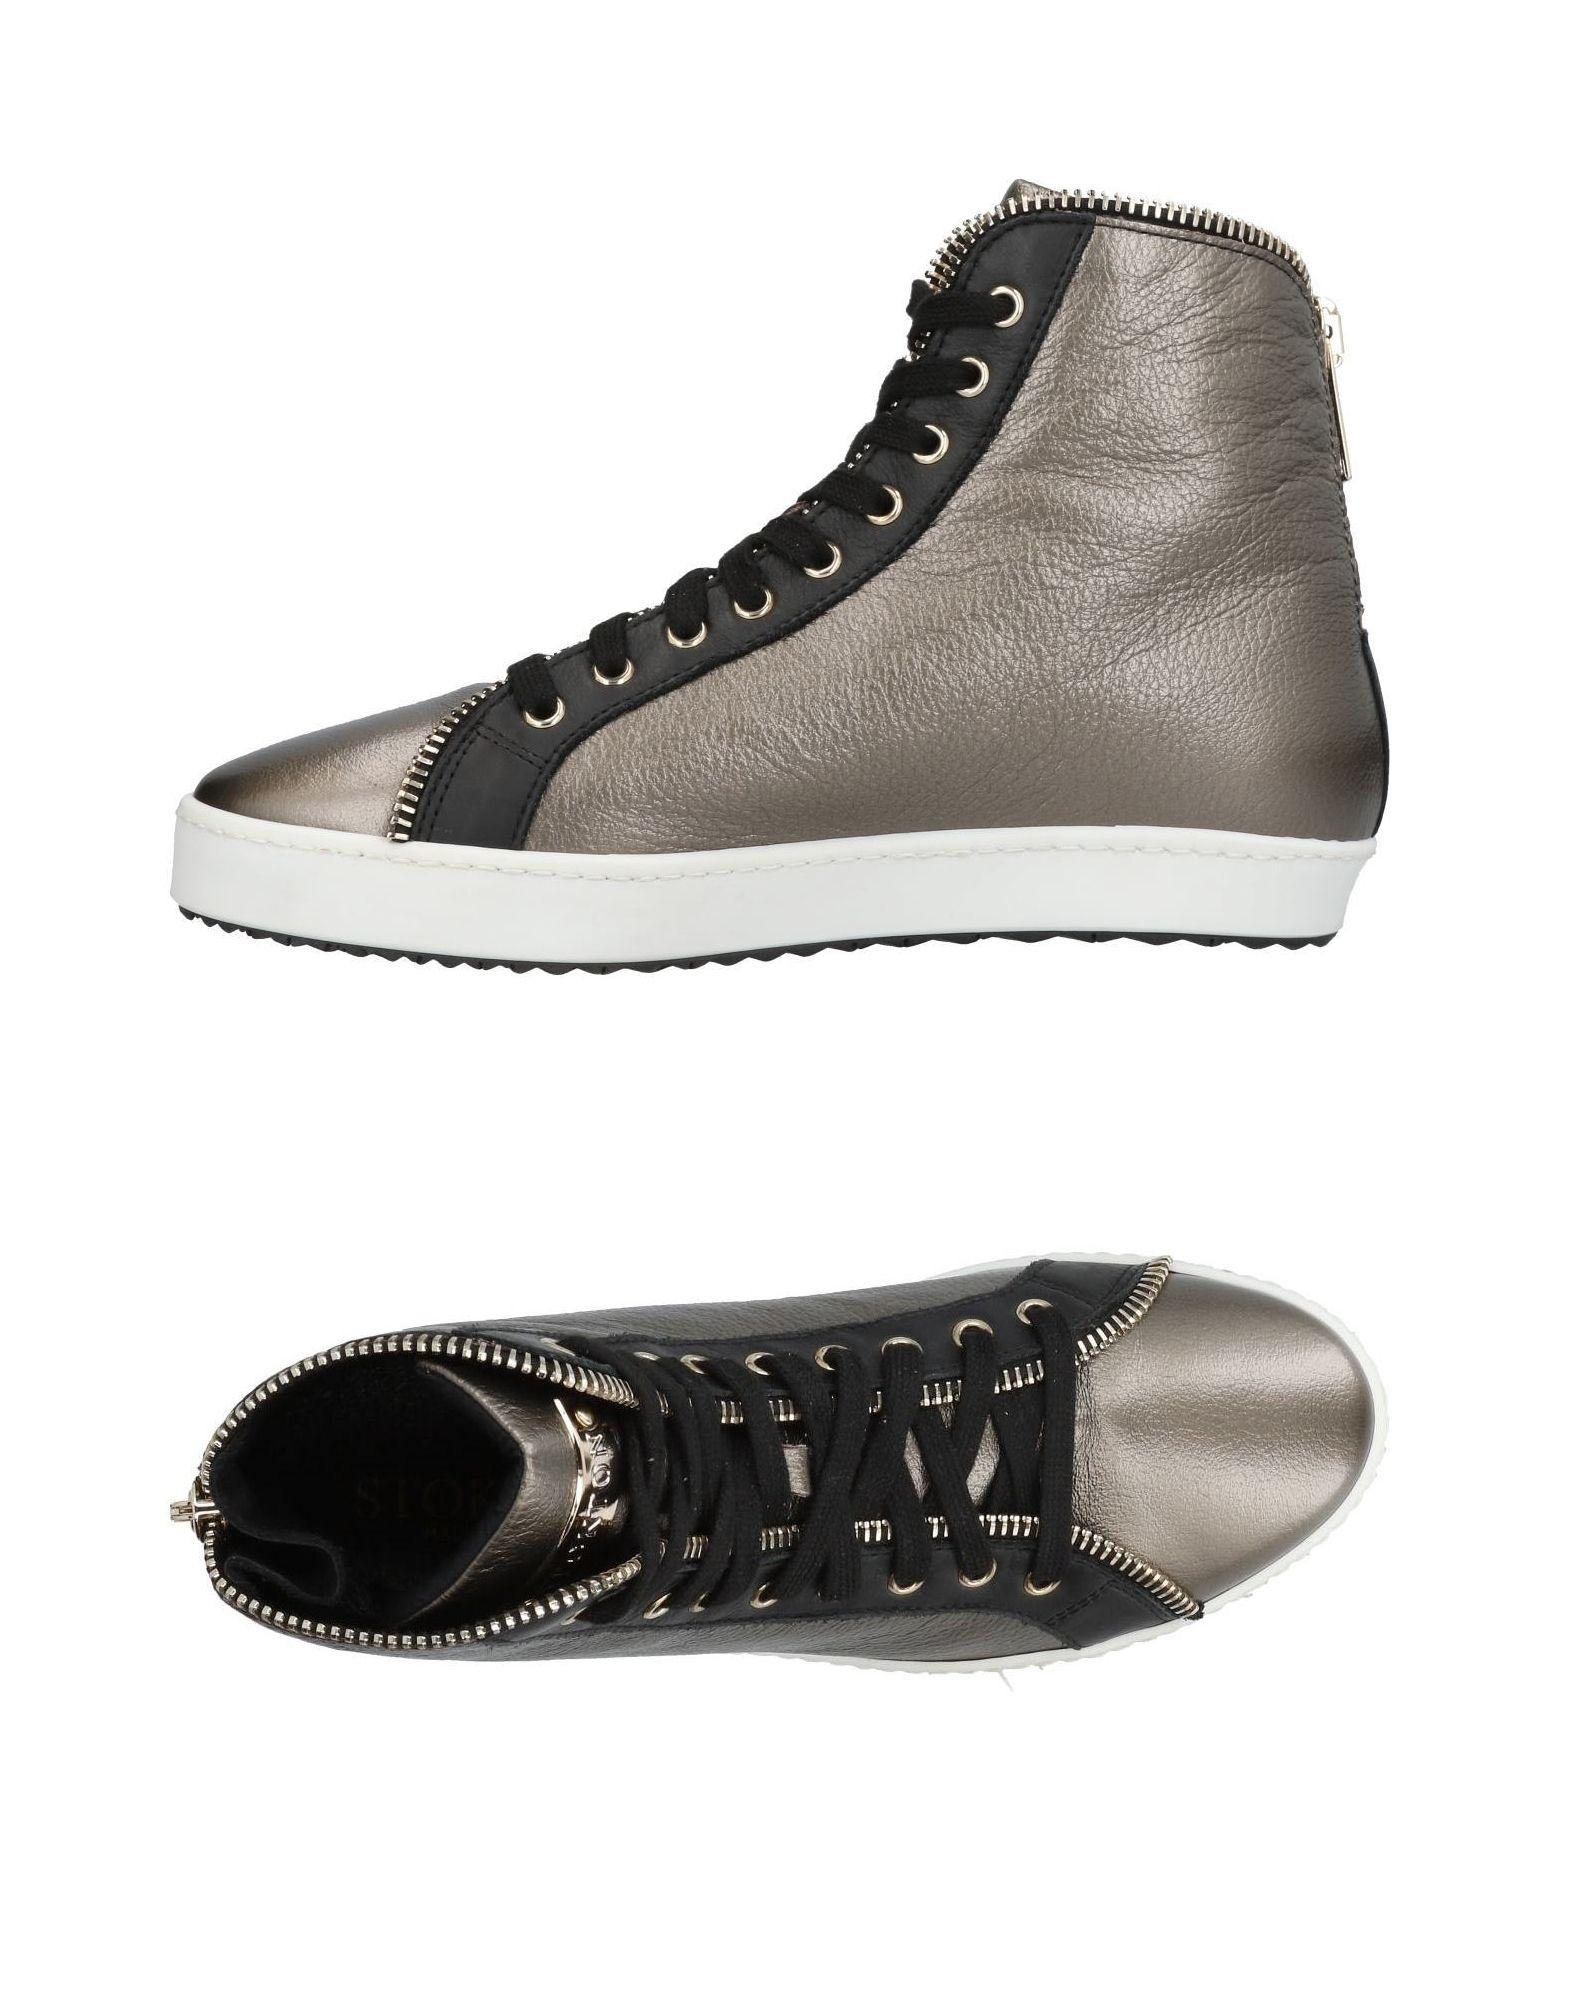 Stokton 11457900QJ Sneakers Damen  11457900QJ Stokton Gute Qualität beliebte Schuhe fd204f